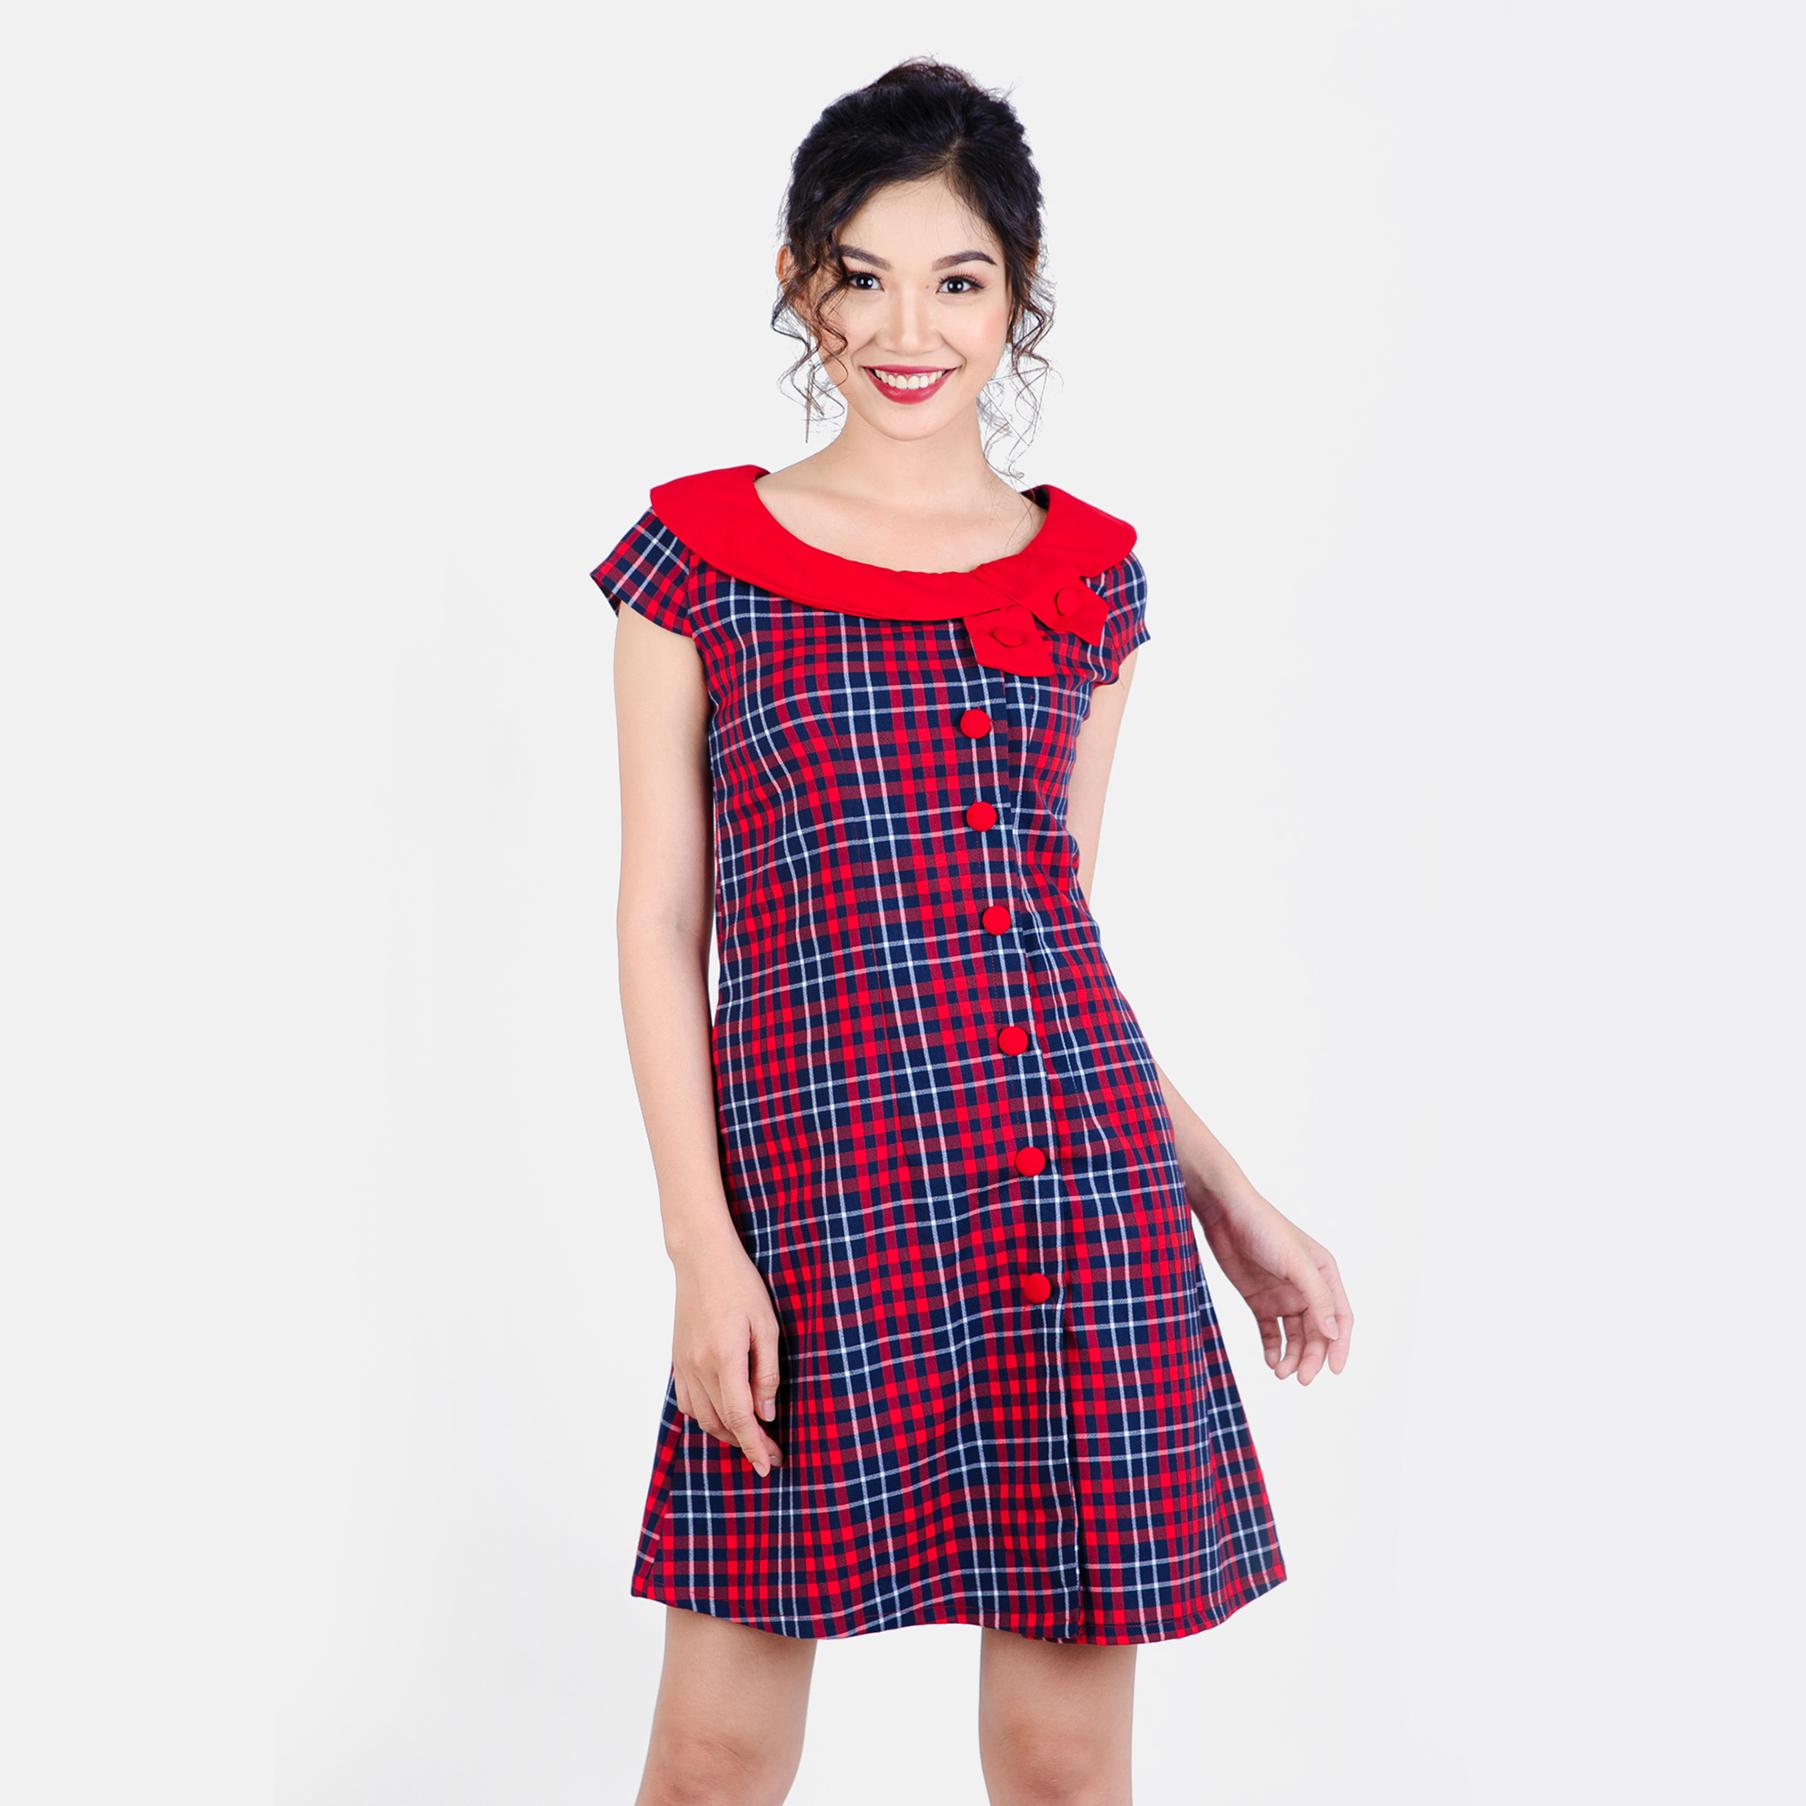 Đầm caro phối nơ cổ thời trang Eden d186 (đỏ)